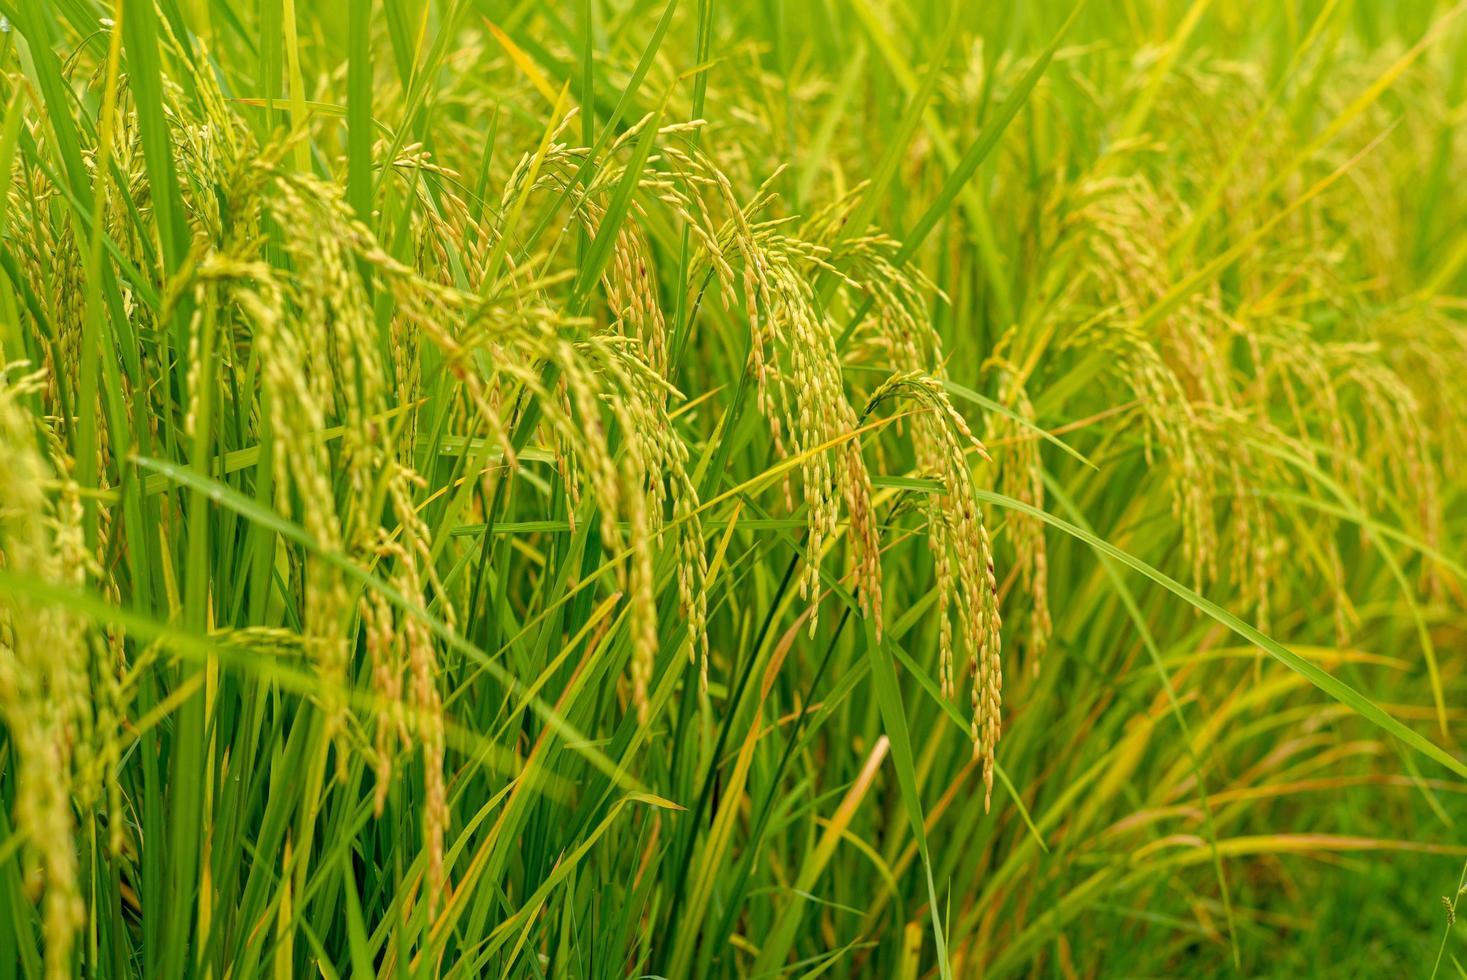 Closeup ear of paddy, jasmine rice, in the field photo